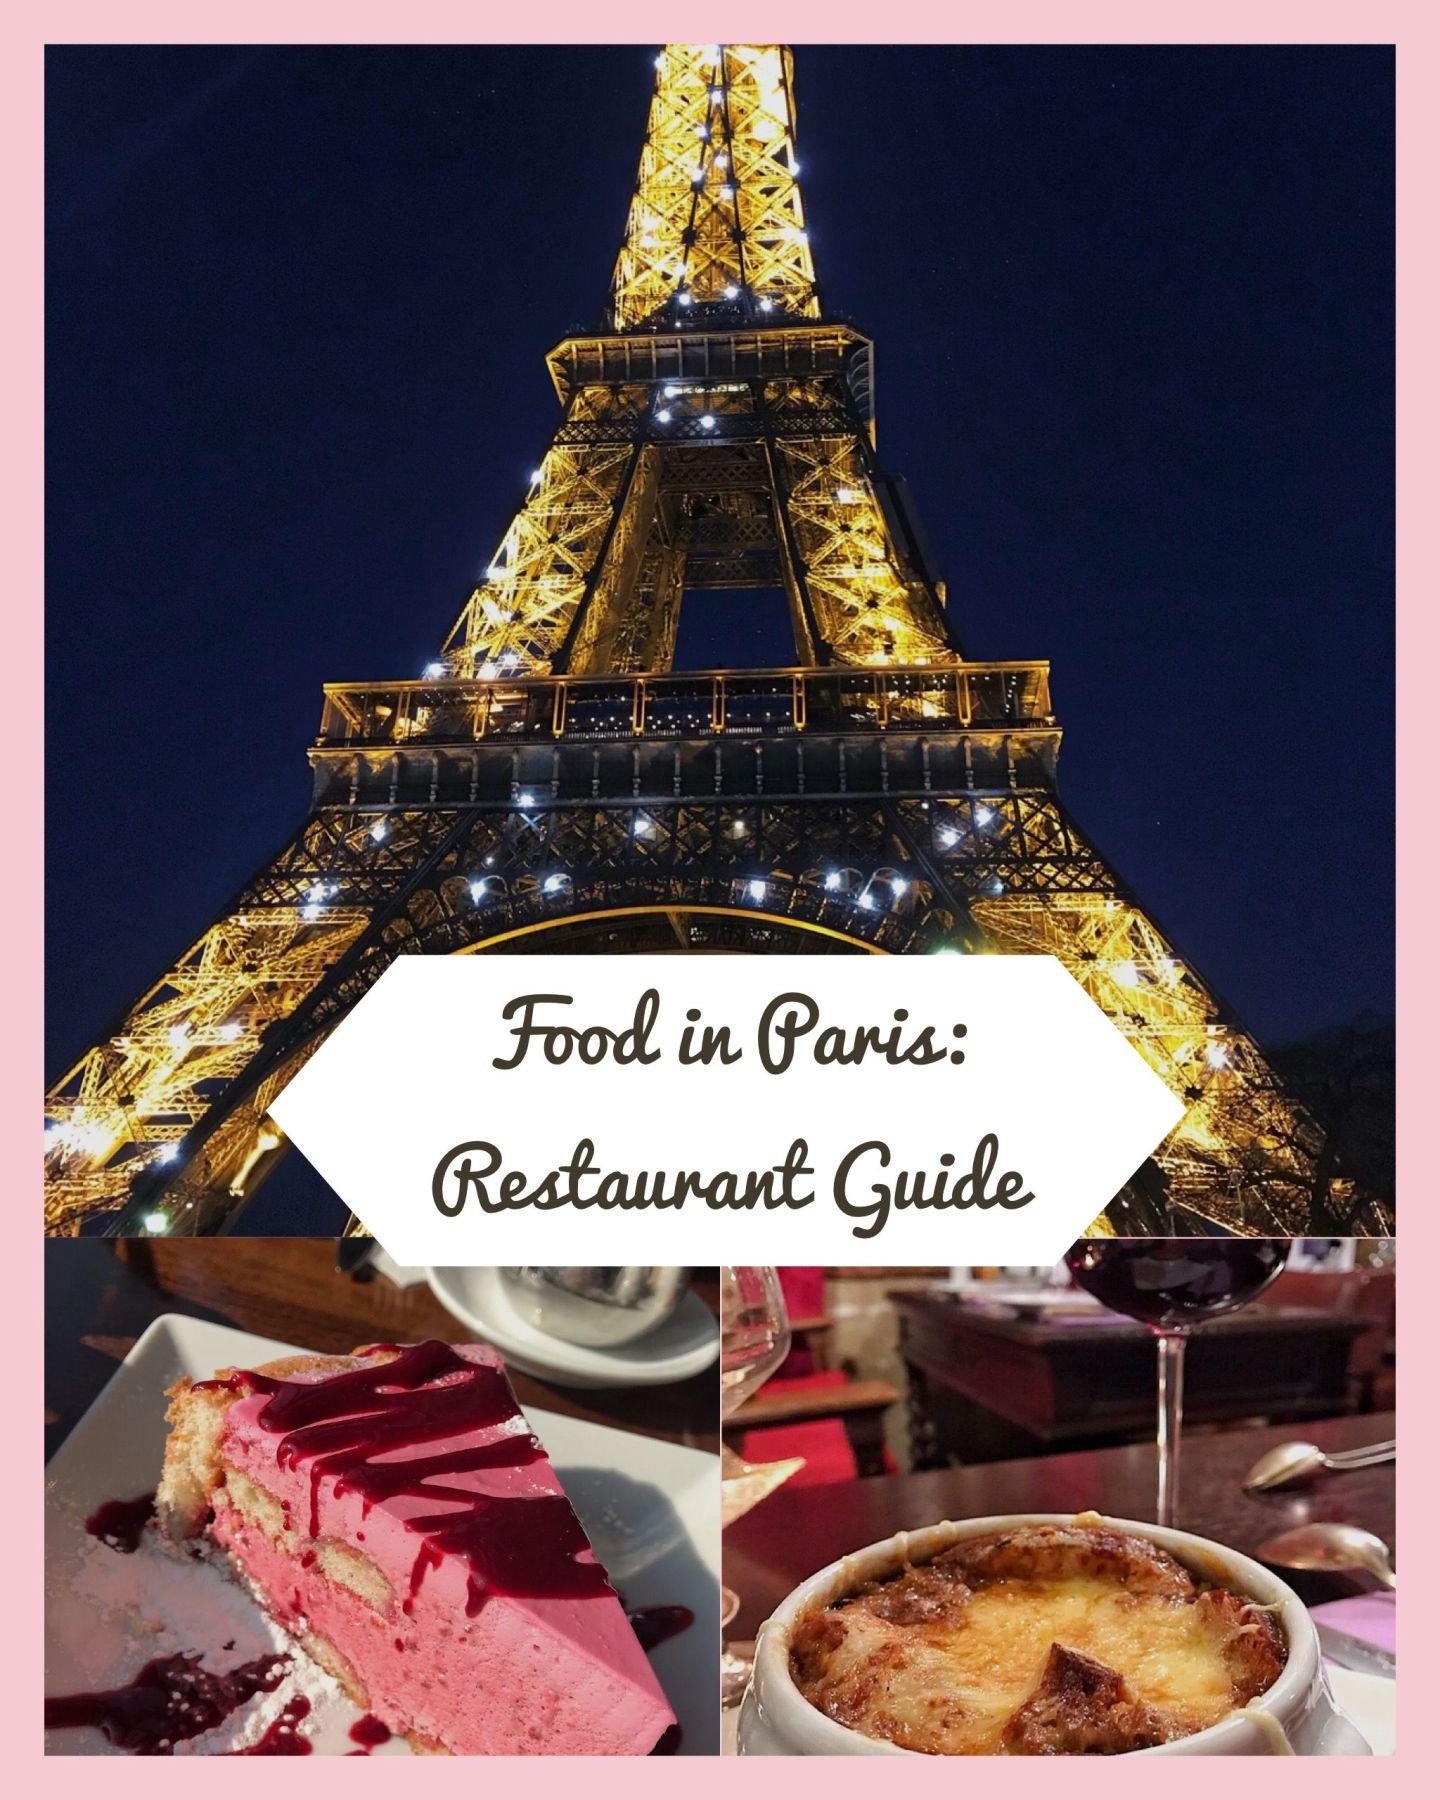 Paris Foodie Guide - Paris Restaurants with Views & Where the Locals Eat in Paris too!